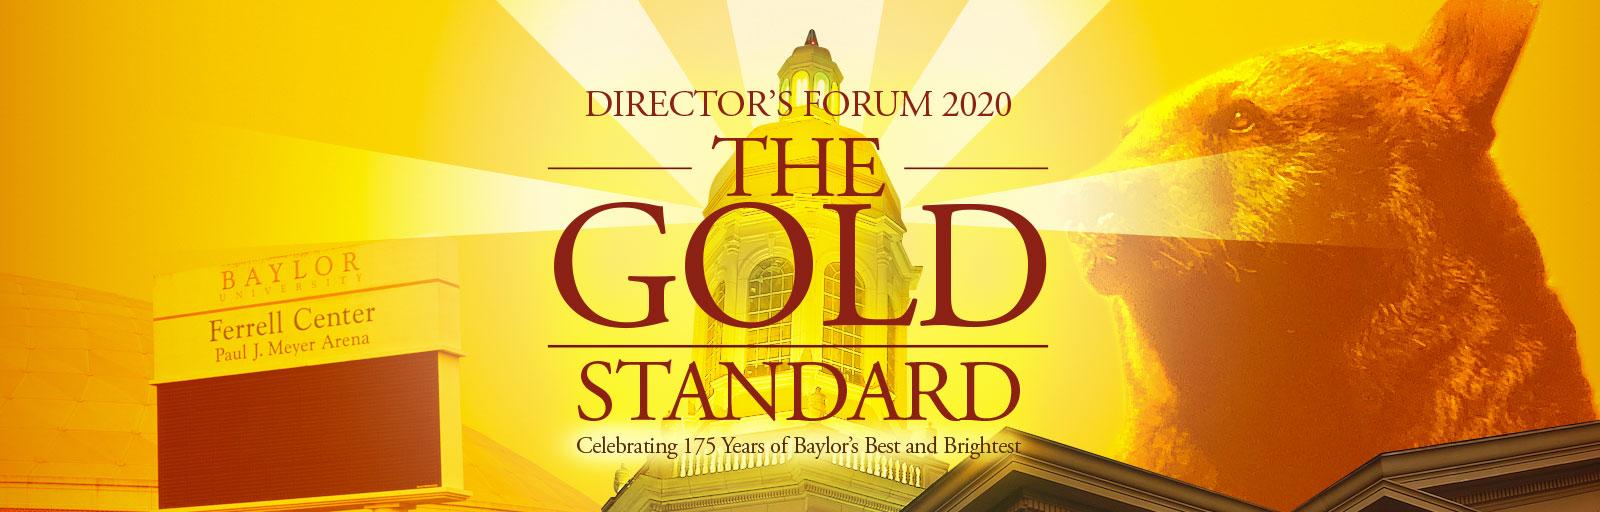 directorsforum2020-goldstandard-slider